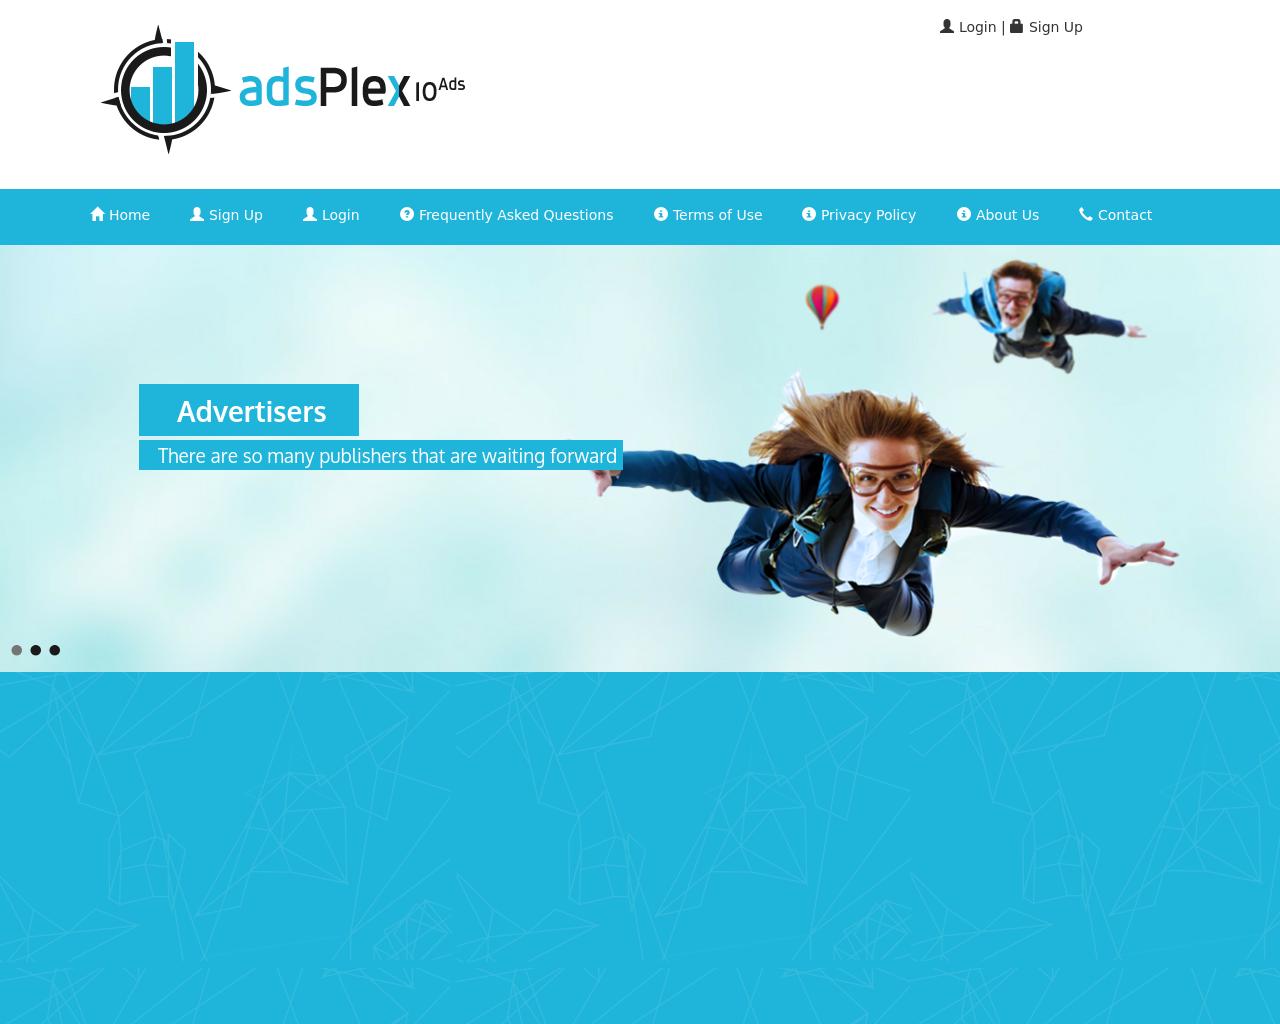 adsPlex-Advertising-Reviews-Pricing